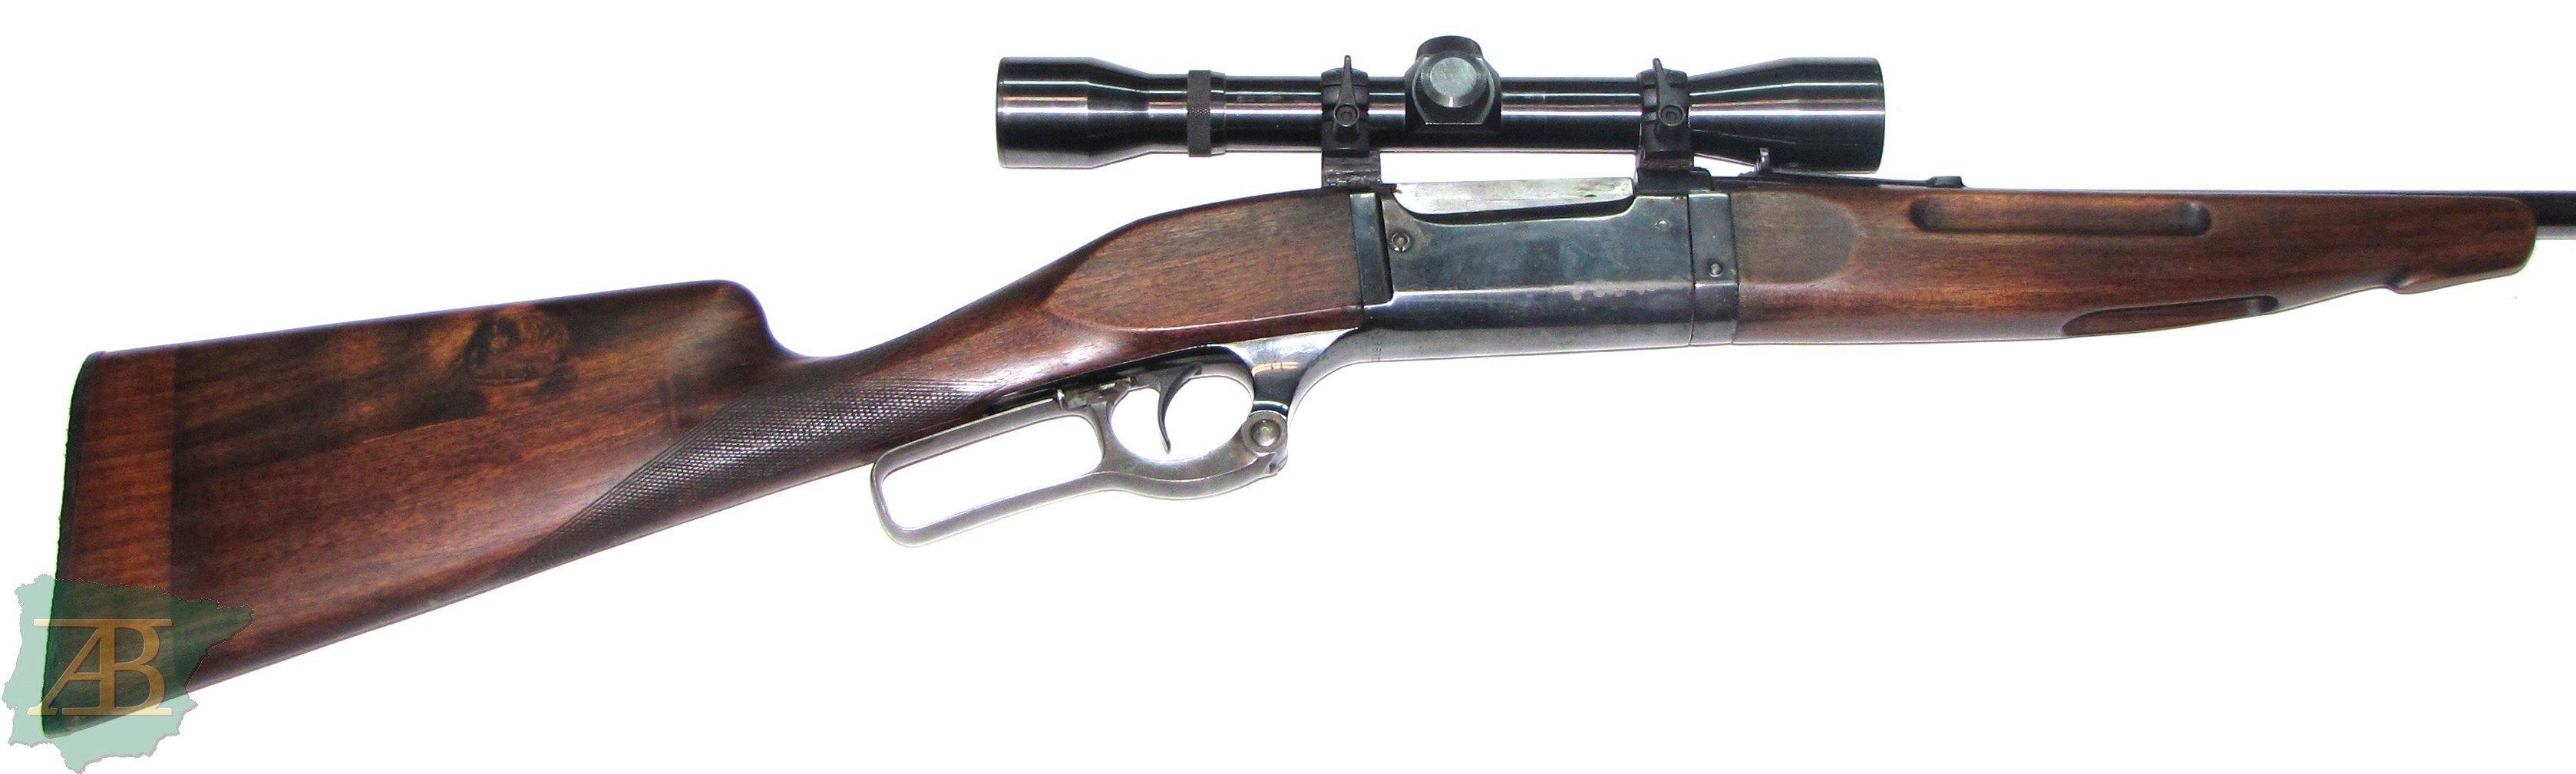 Rifle de cerrojo de palanca SAVAGE 1899 ref REP2019-732-armeriaiberica-2